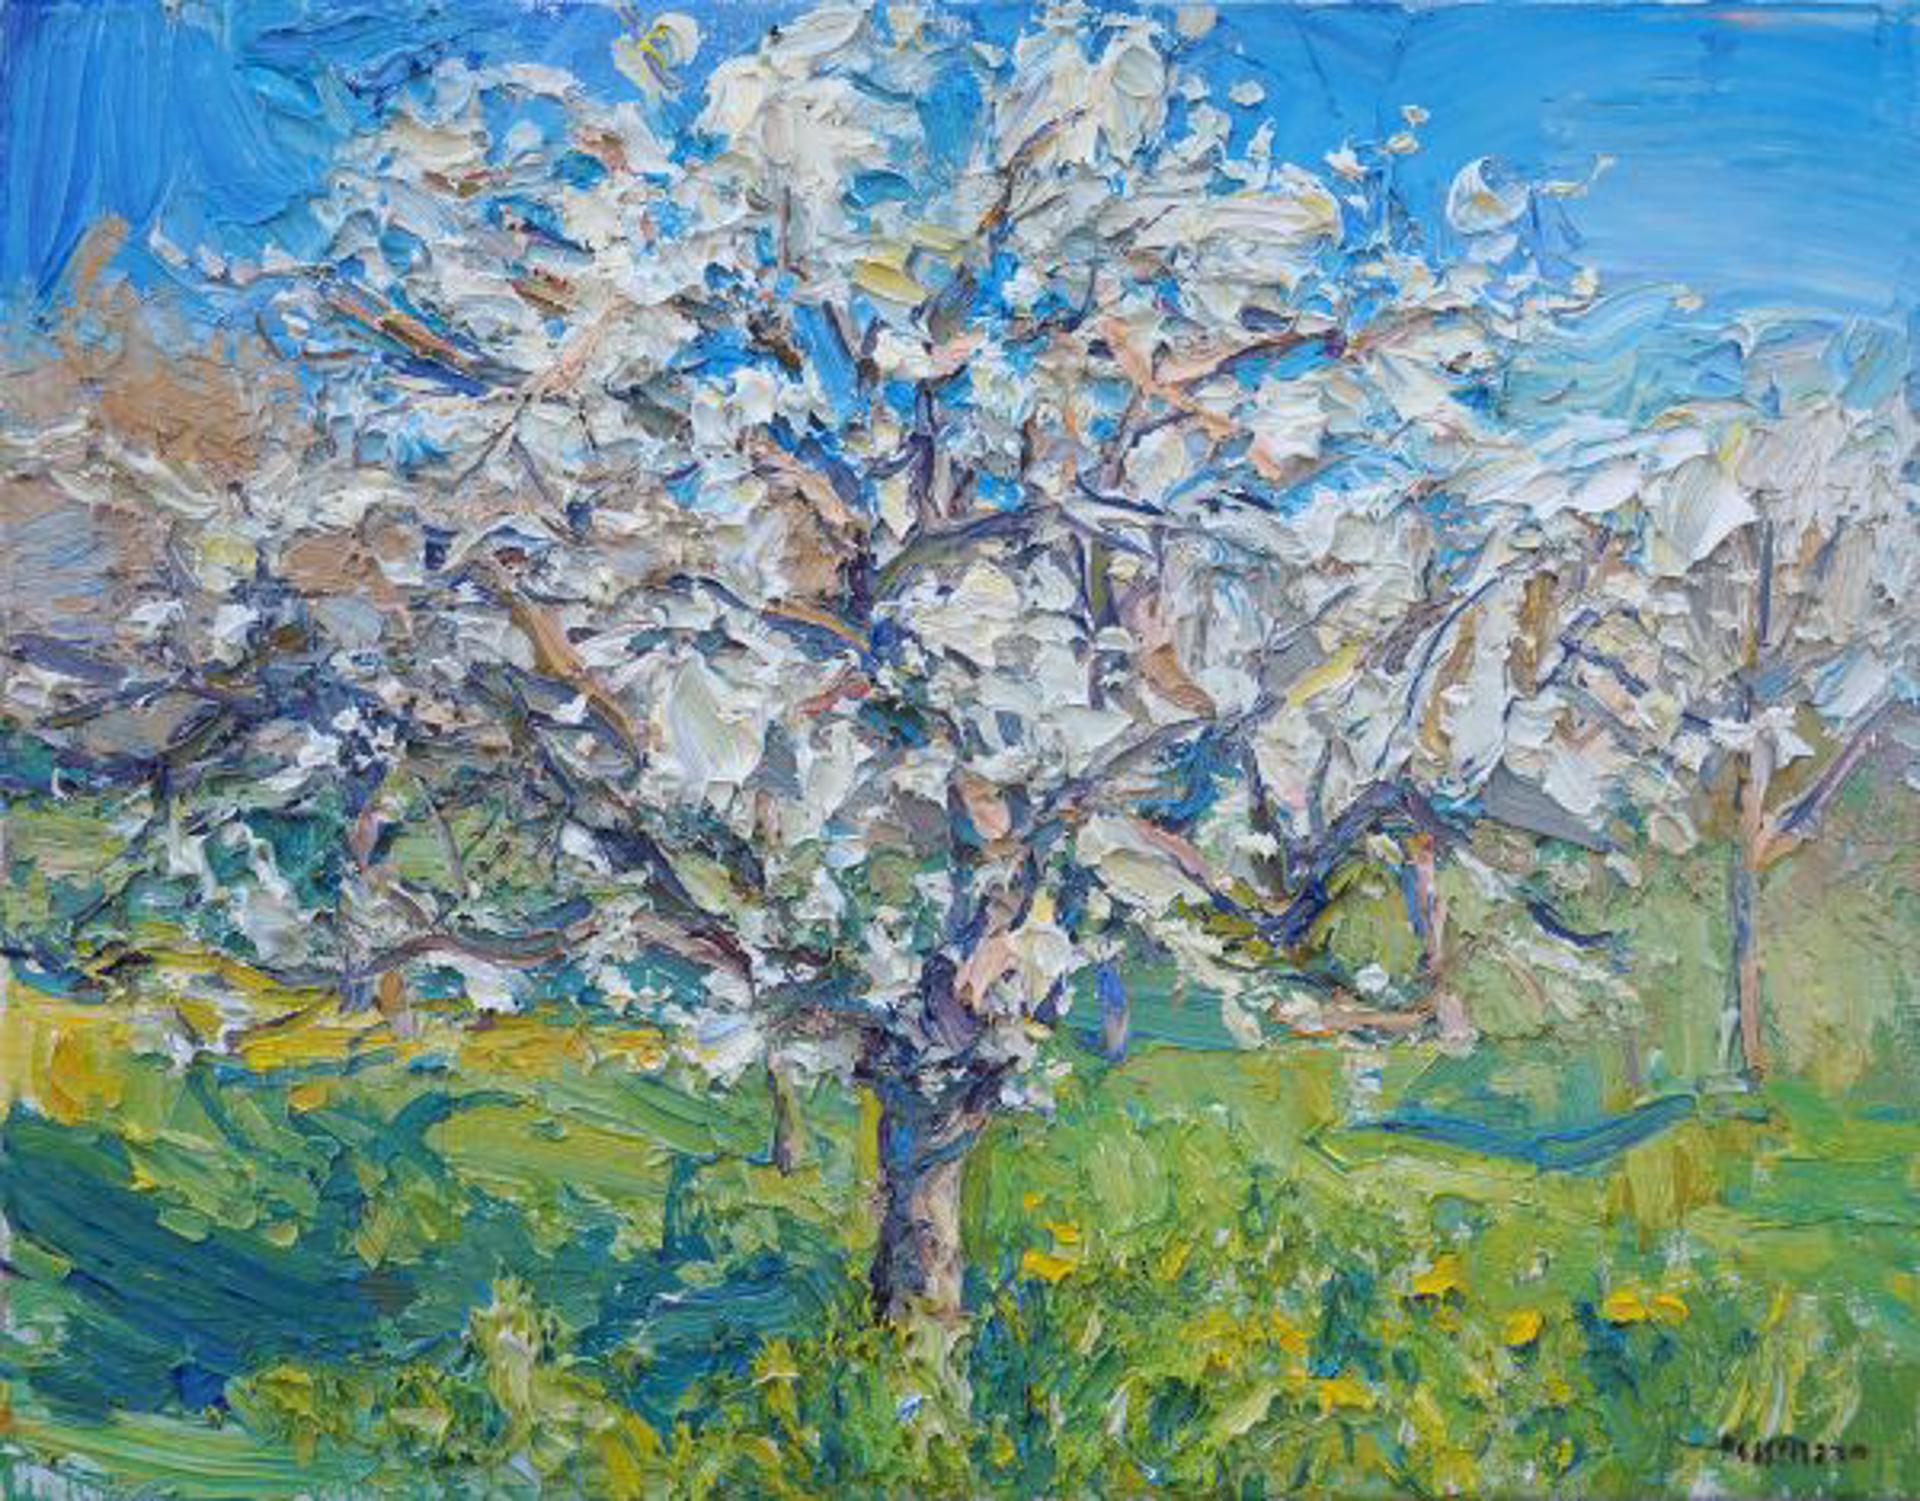 Blooming Orchard by Antonin Passemard